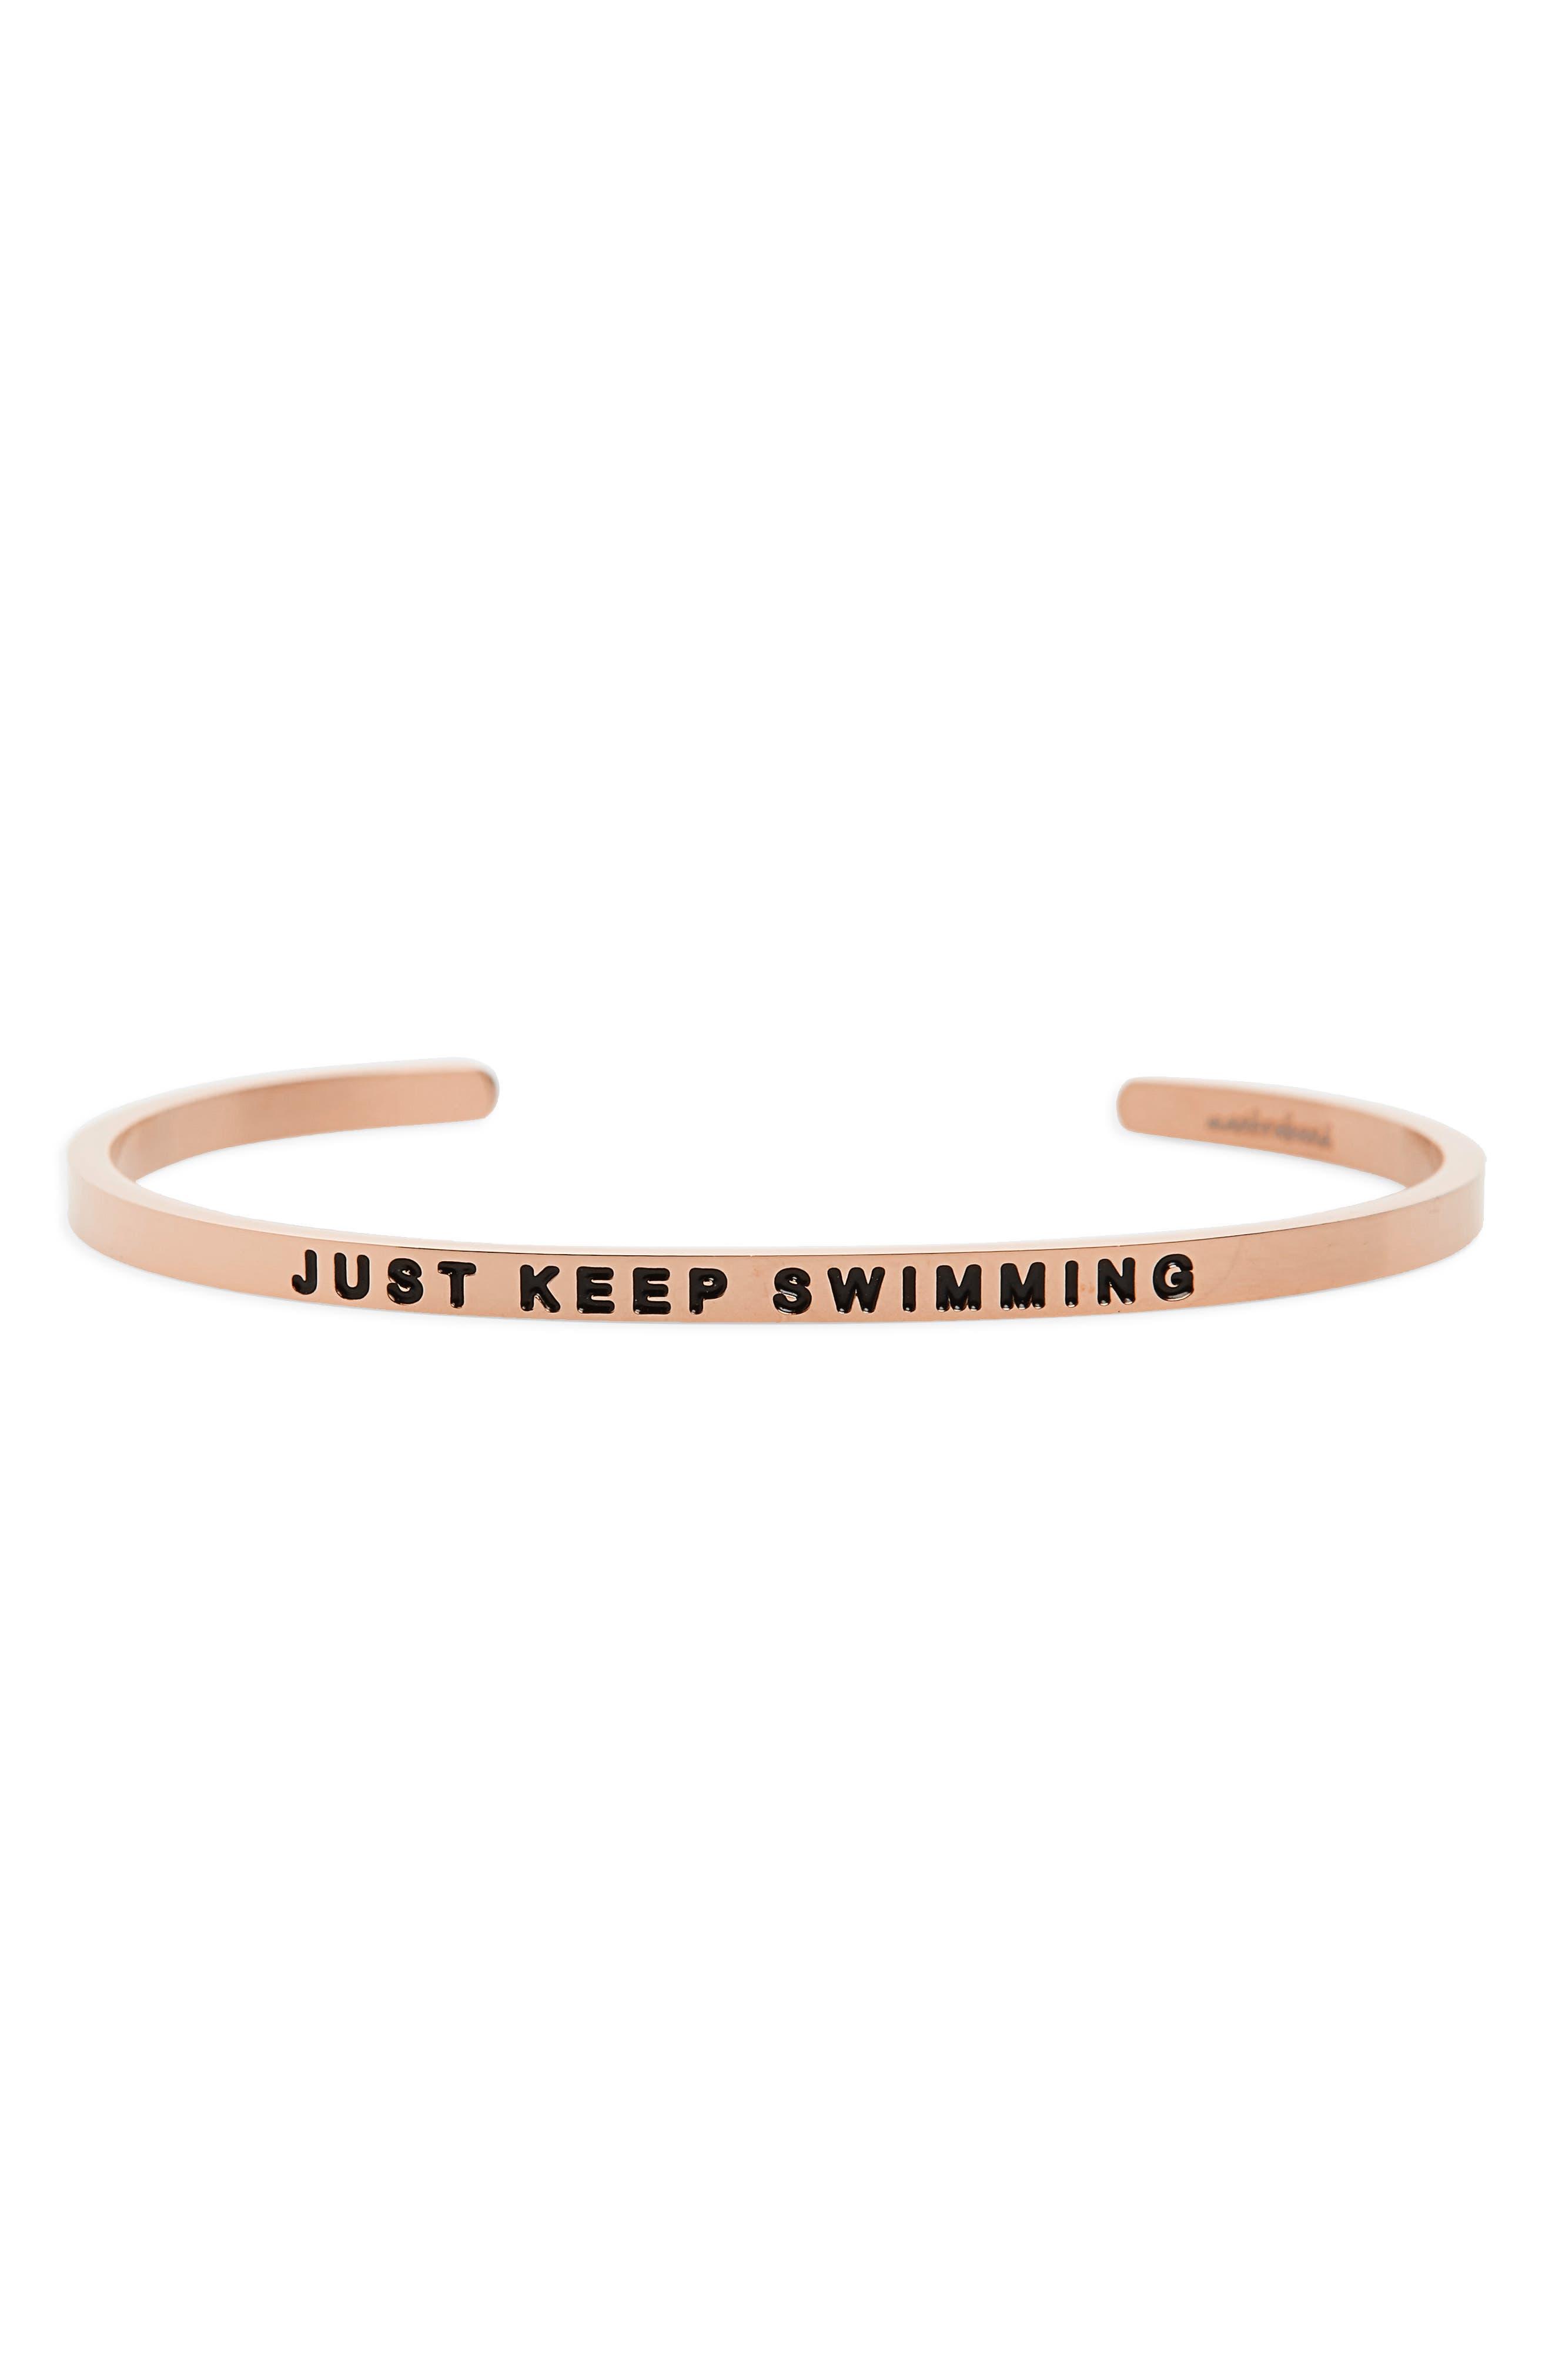 Main Image - MantraBand Just Keep Swimming Engraved Cuff